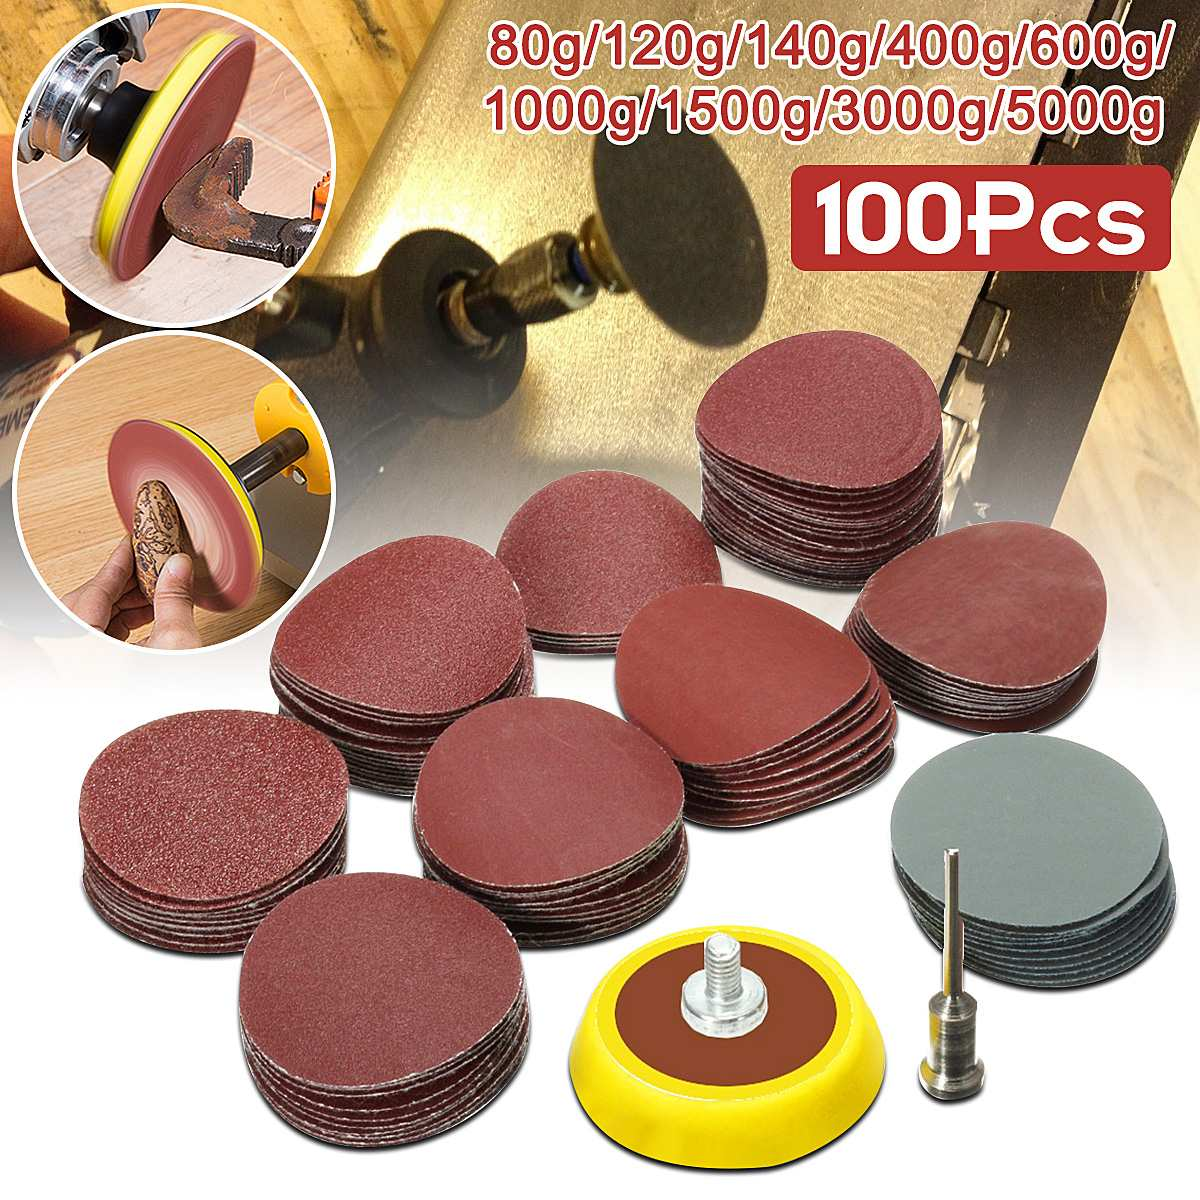 100 pcs 25mm/Lixa + 1 pcs 1 1 polegada polegada Gancho Loop Backer Placa 1/8 polegada Shank + 1 pcs Loop Lixar Pad Polimento Abrasivos Misturados